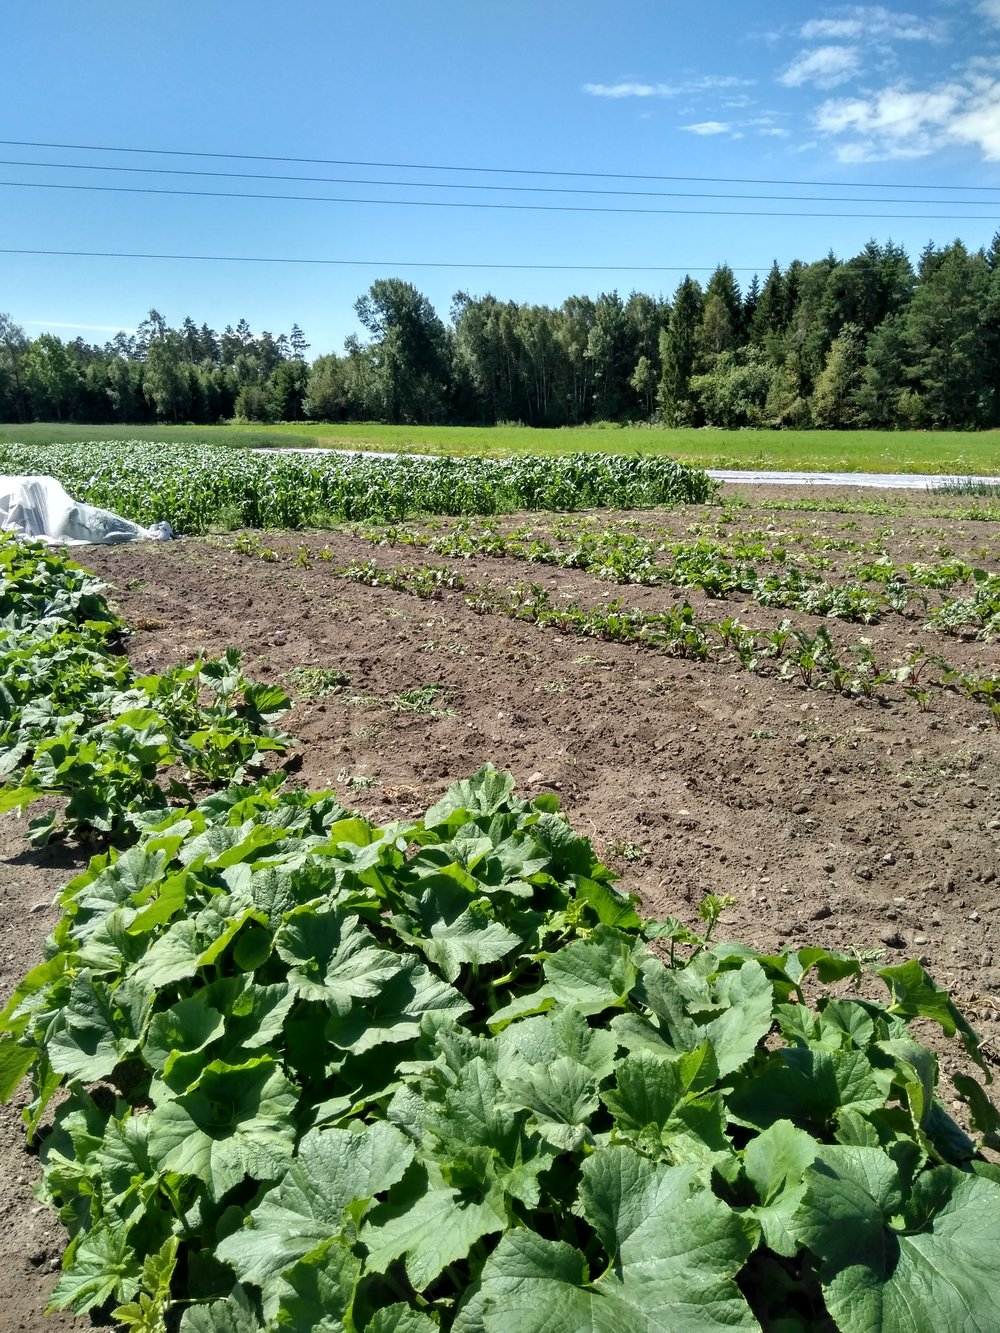 Gresskarplanter i forgrunnen, mais lengst unna. Bilde tatt 14.juli 2017.